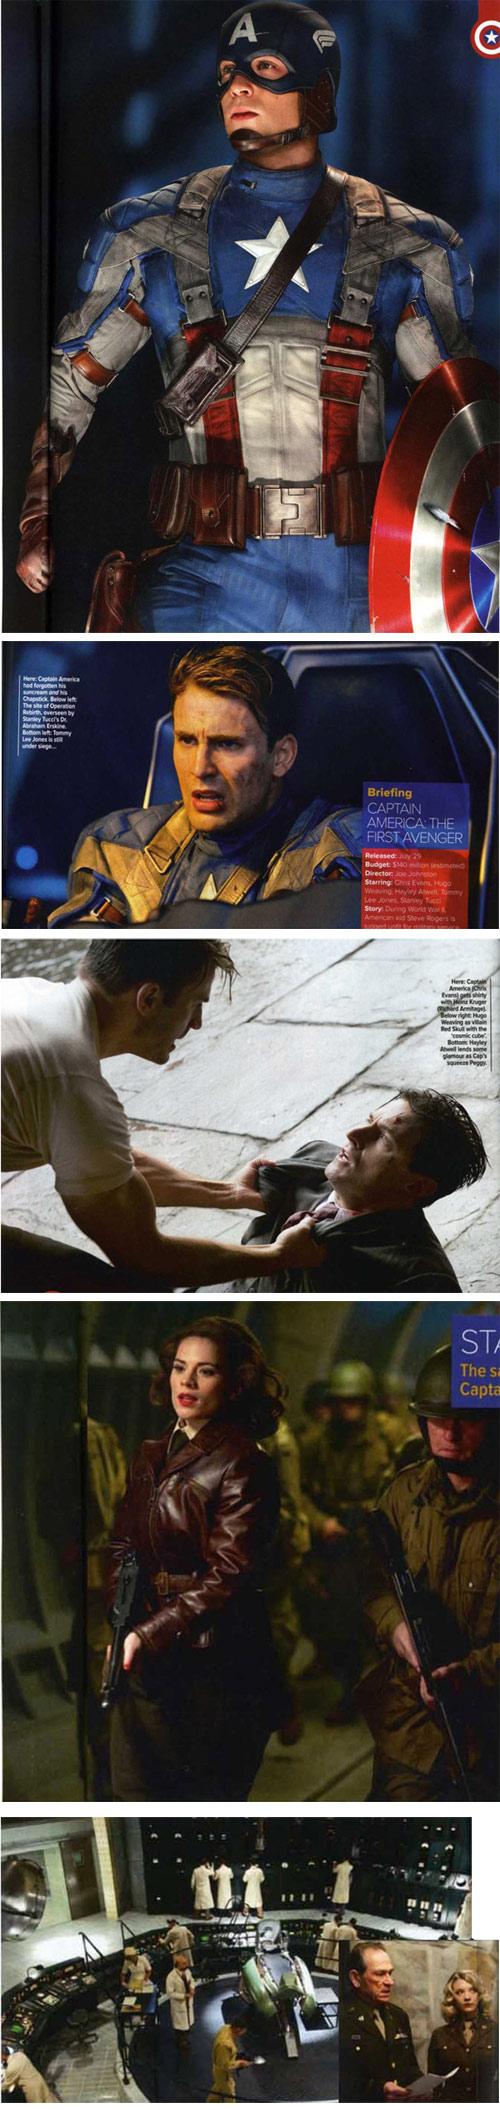 Captain America images